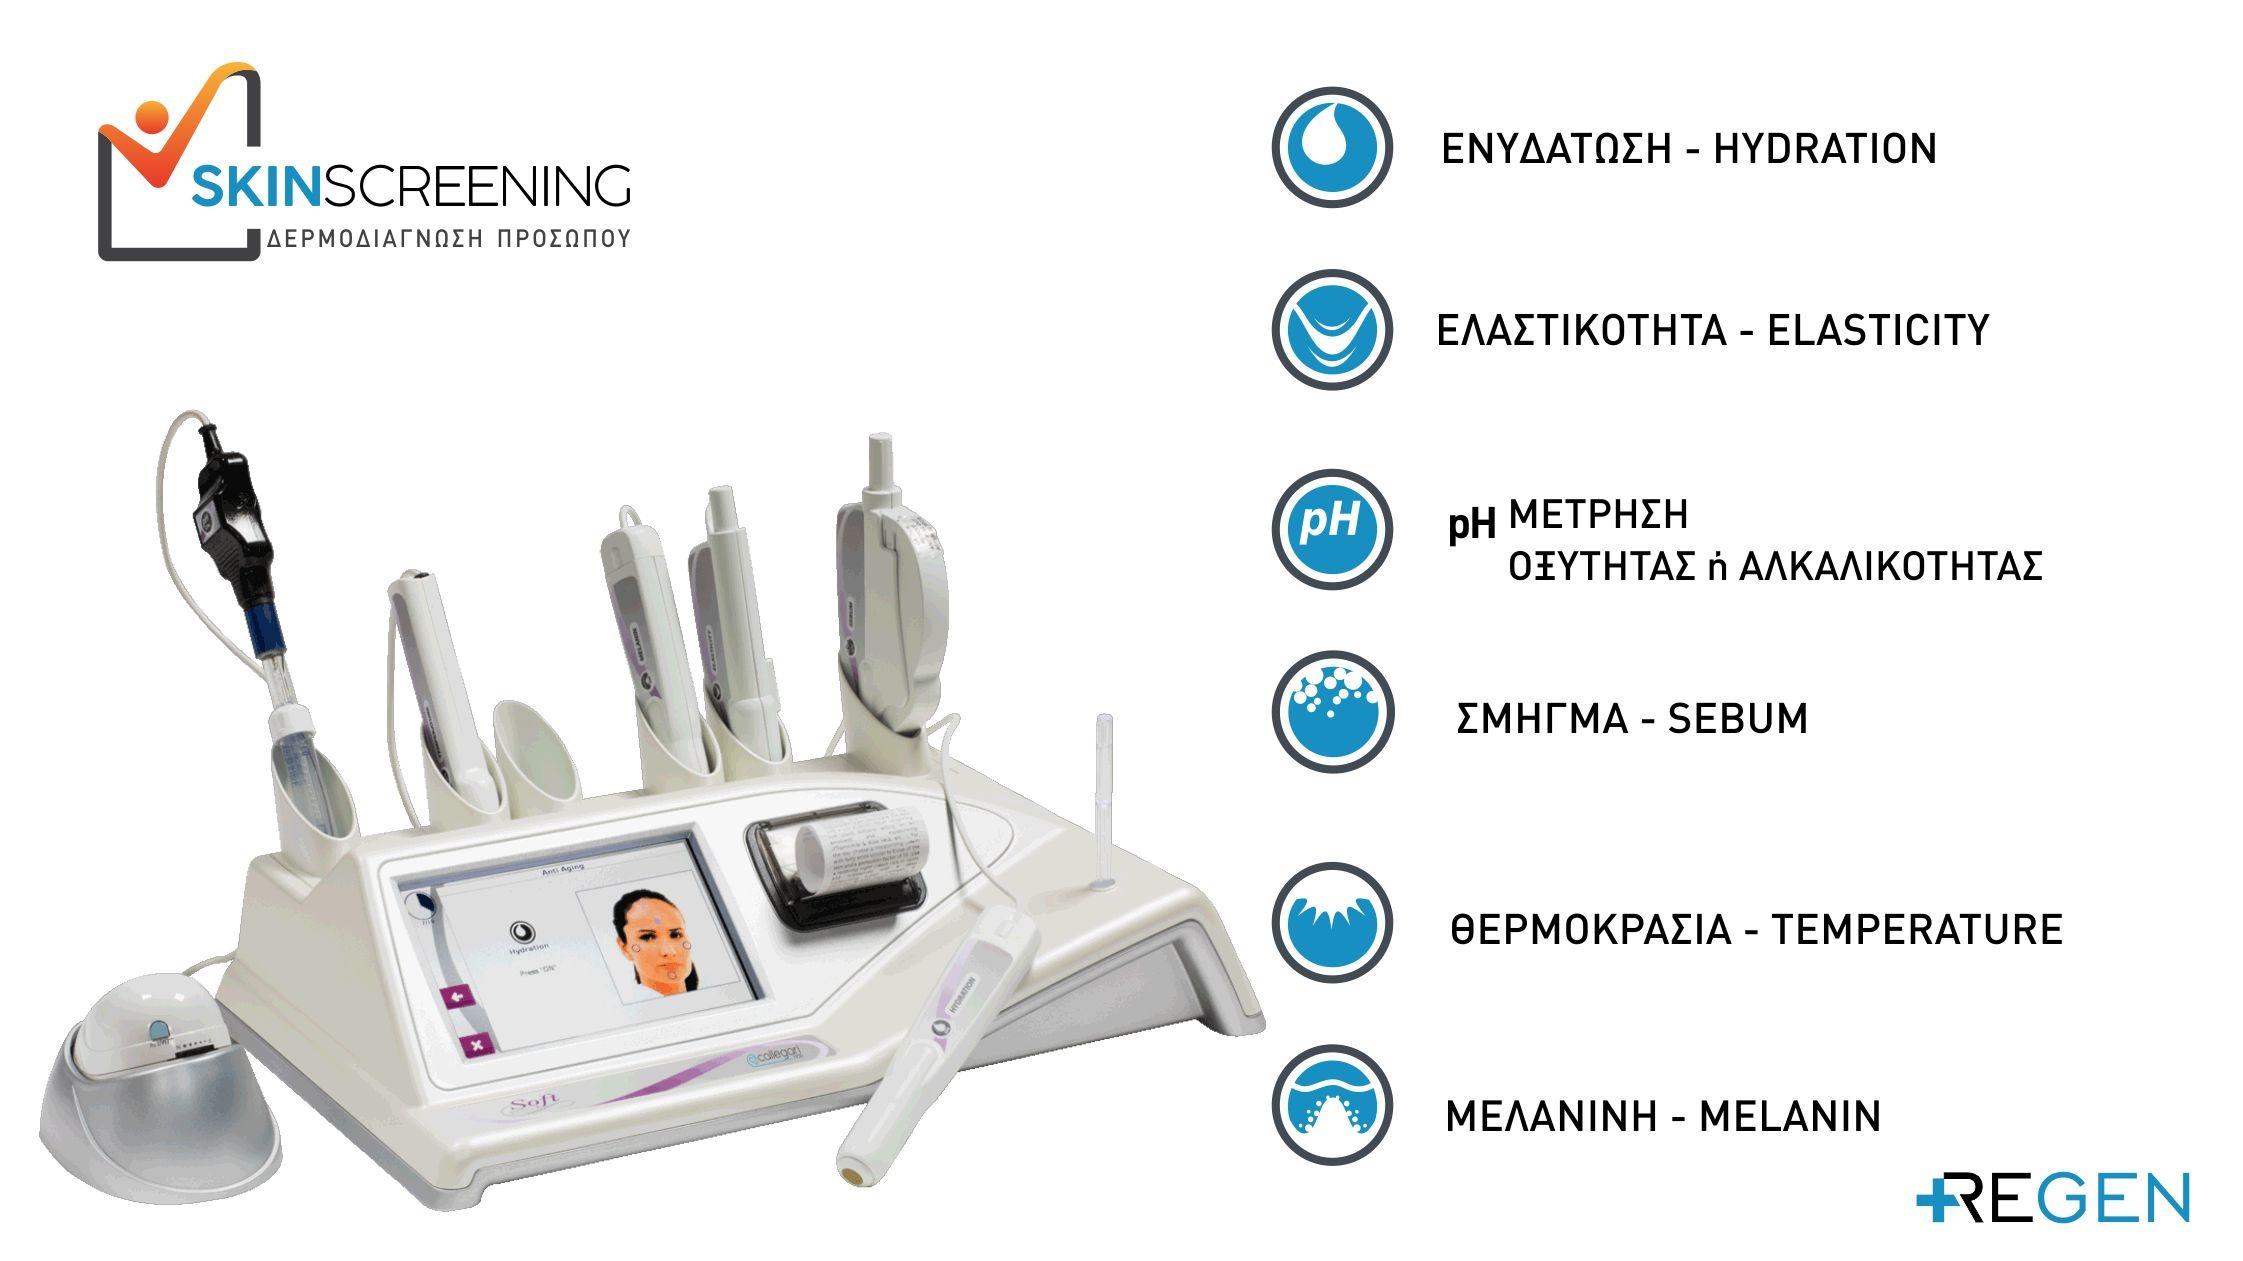 Skin Screening card05